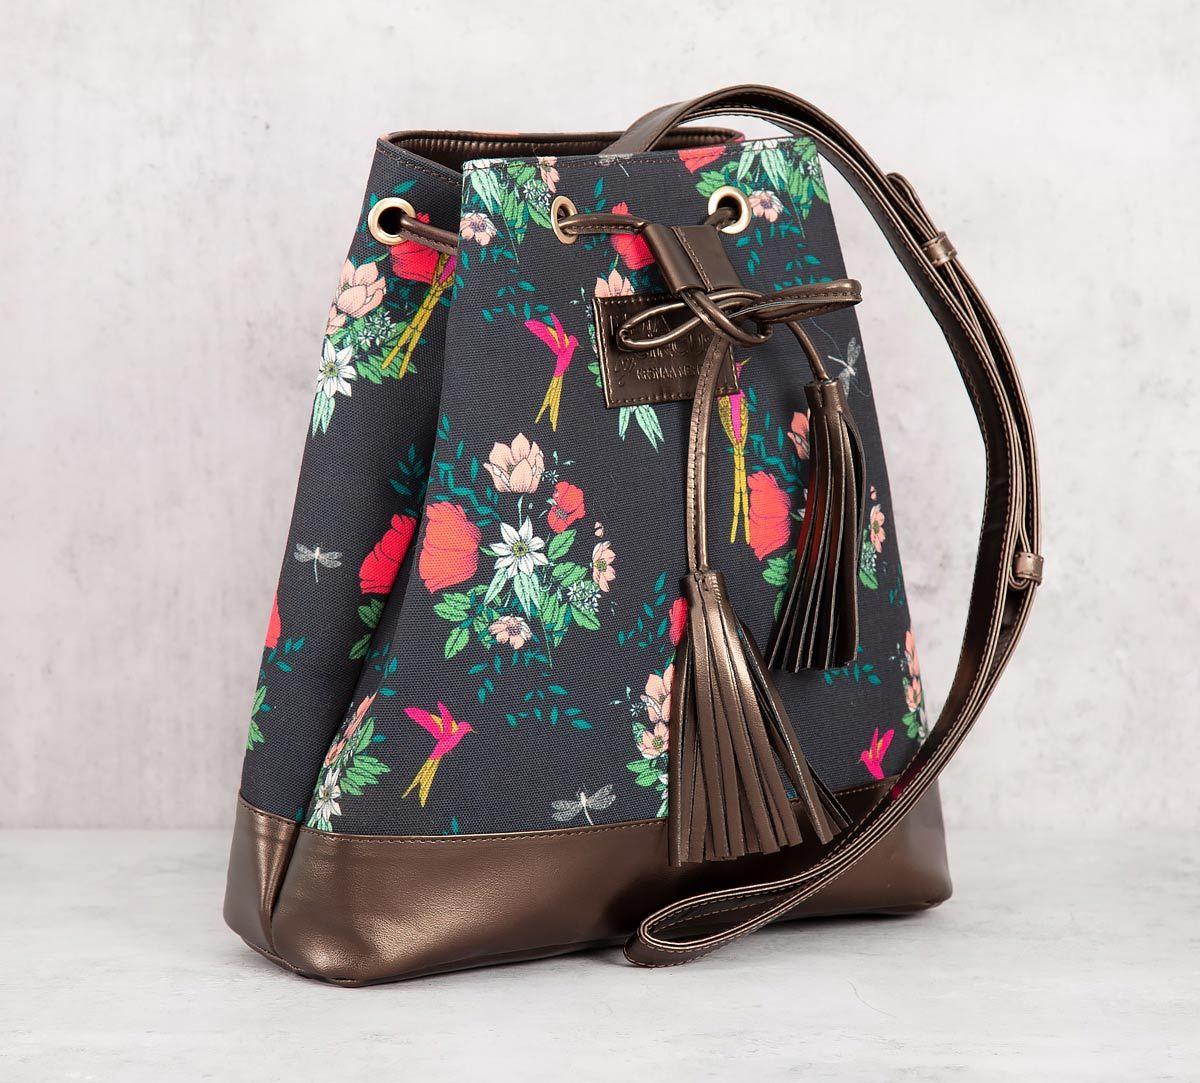 India Circus Floral Fascination Hobo Bag